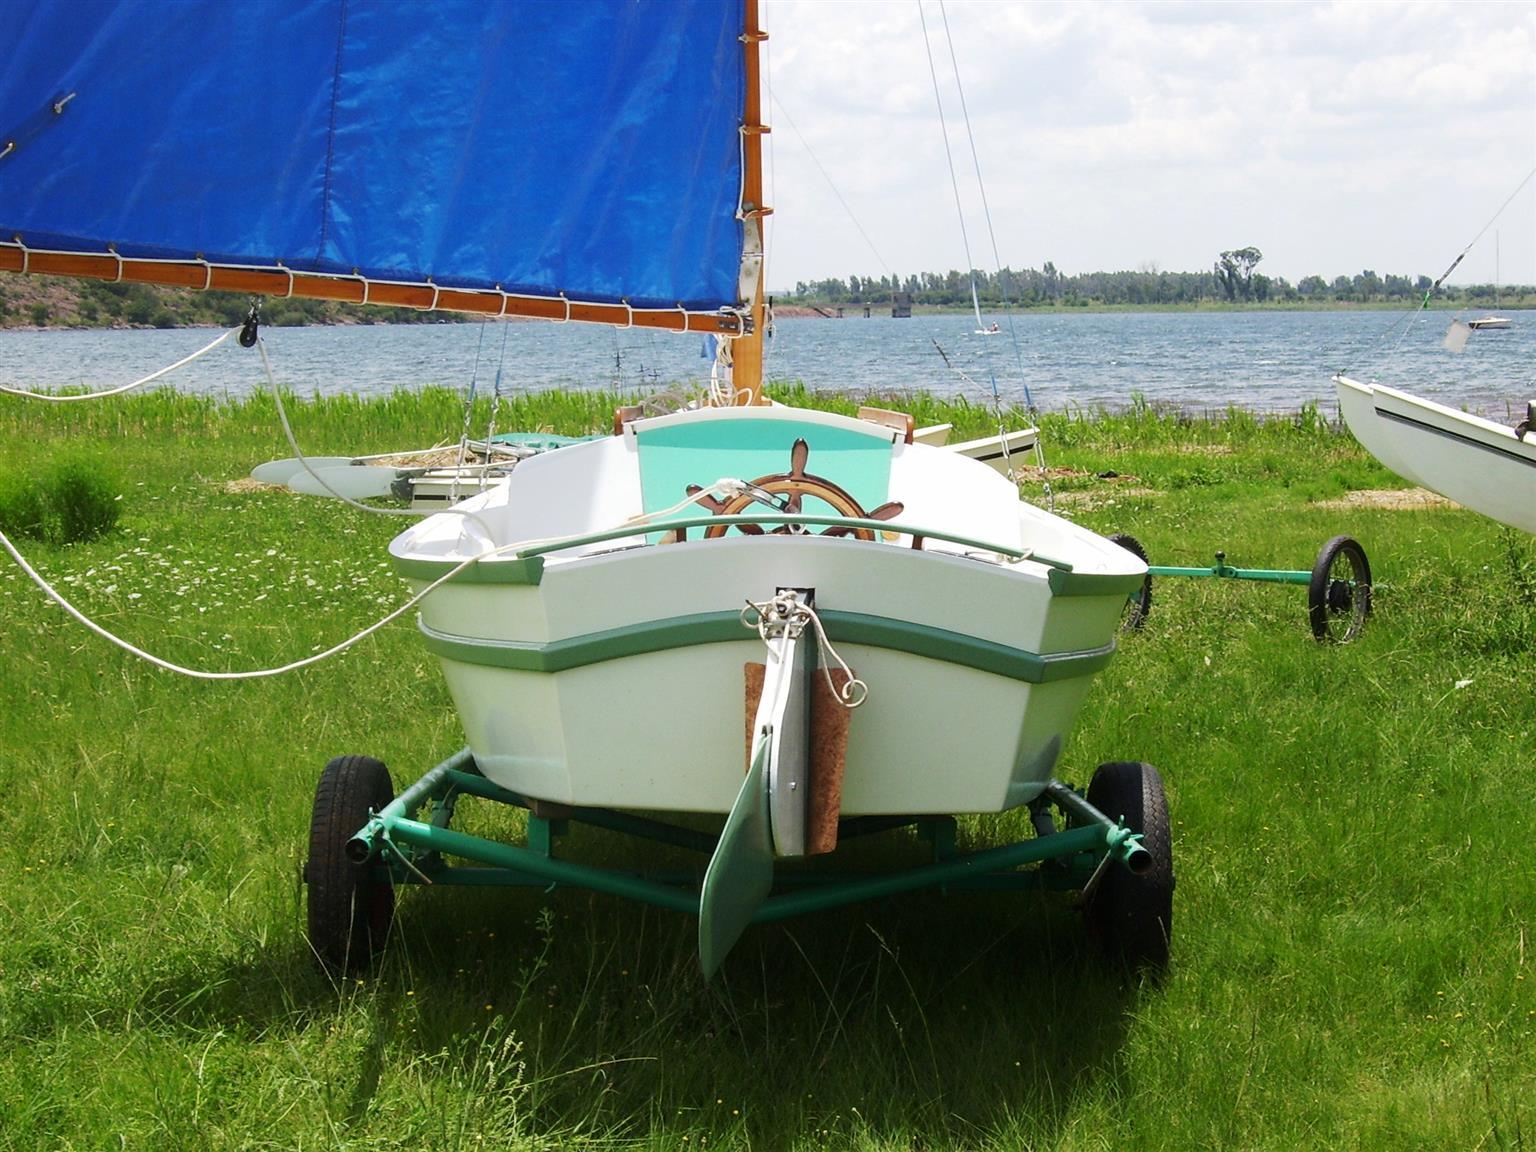 Sailboat Trailer For Sale >> Weekender Sailboat On Trailer For Sale